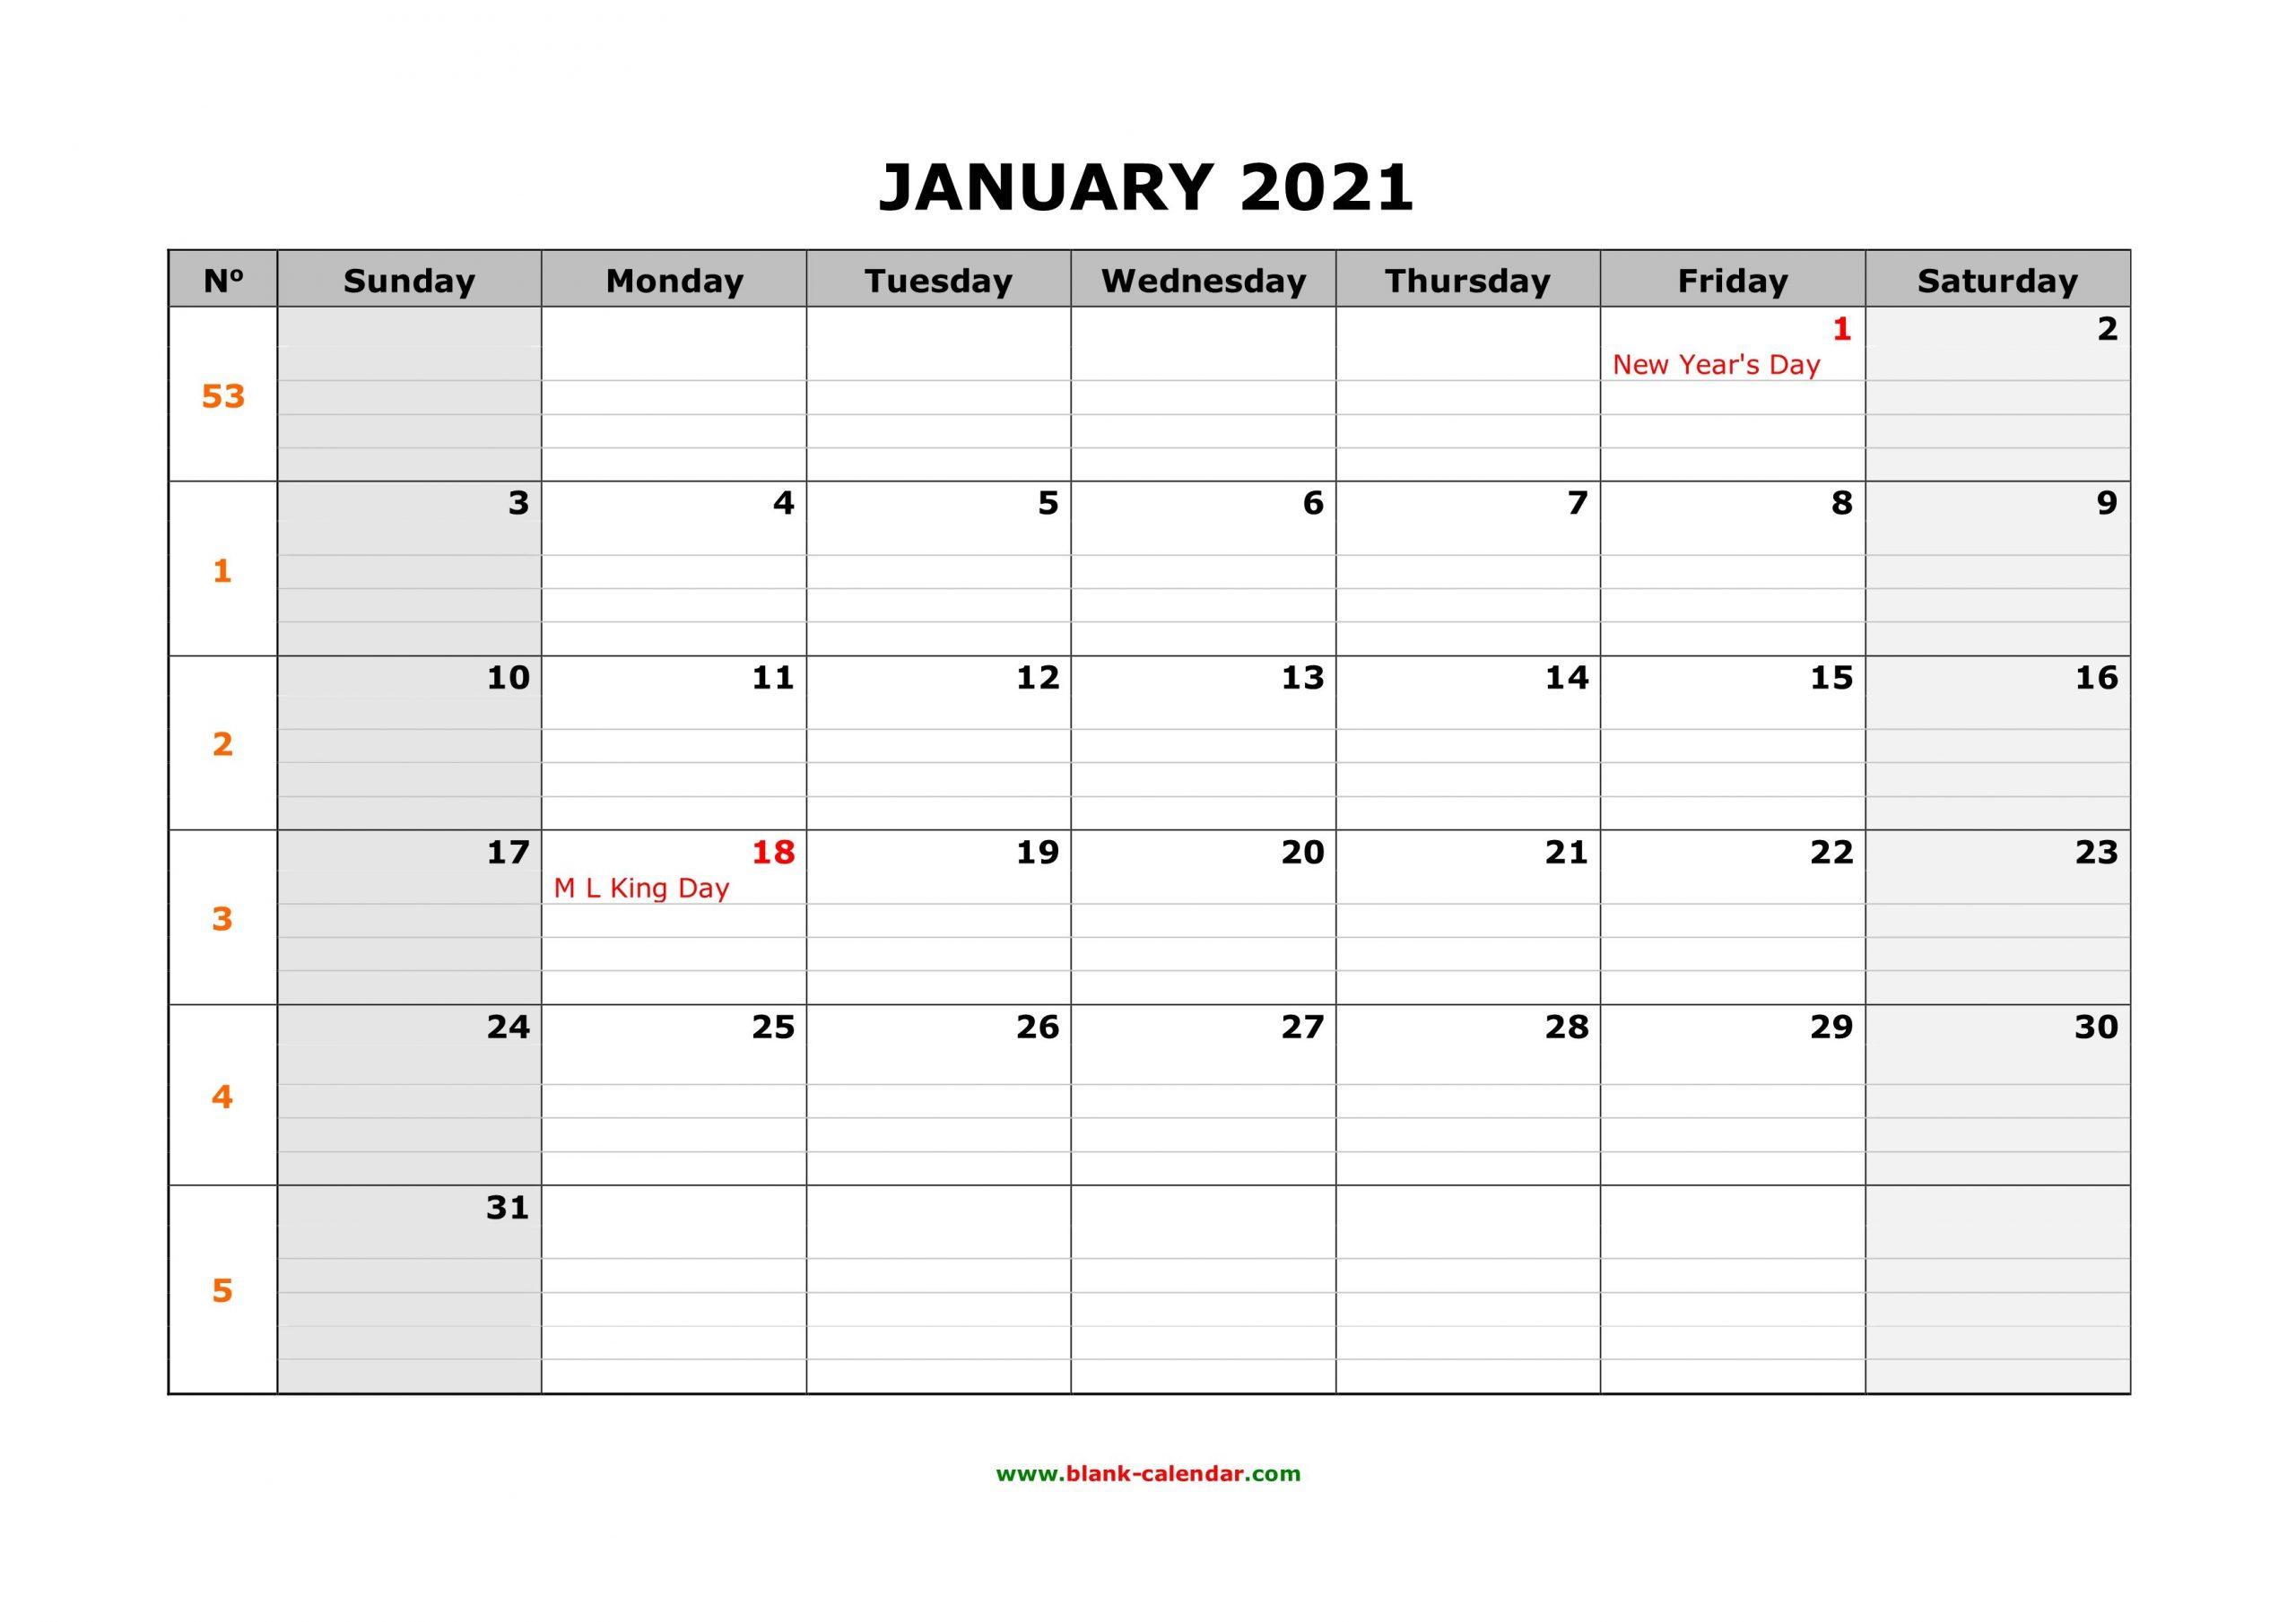 Free Download Printable Calendar 2021, Large Box Grid Blank Lined Calendar To Print